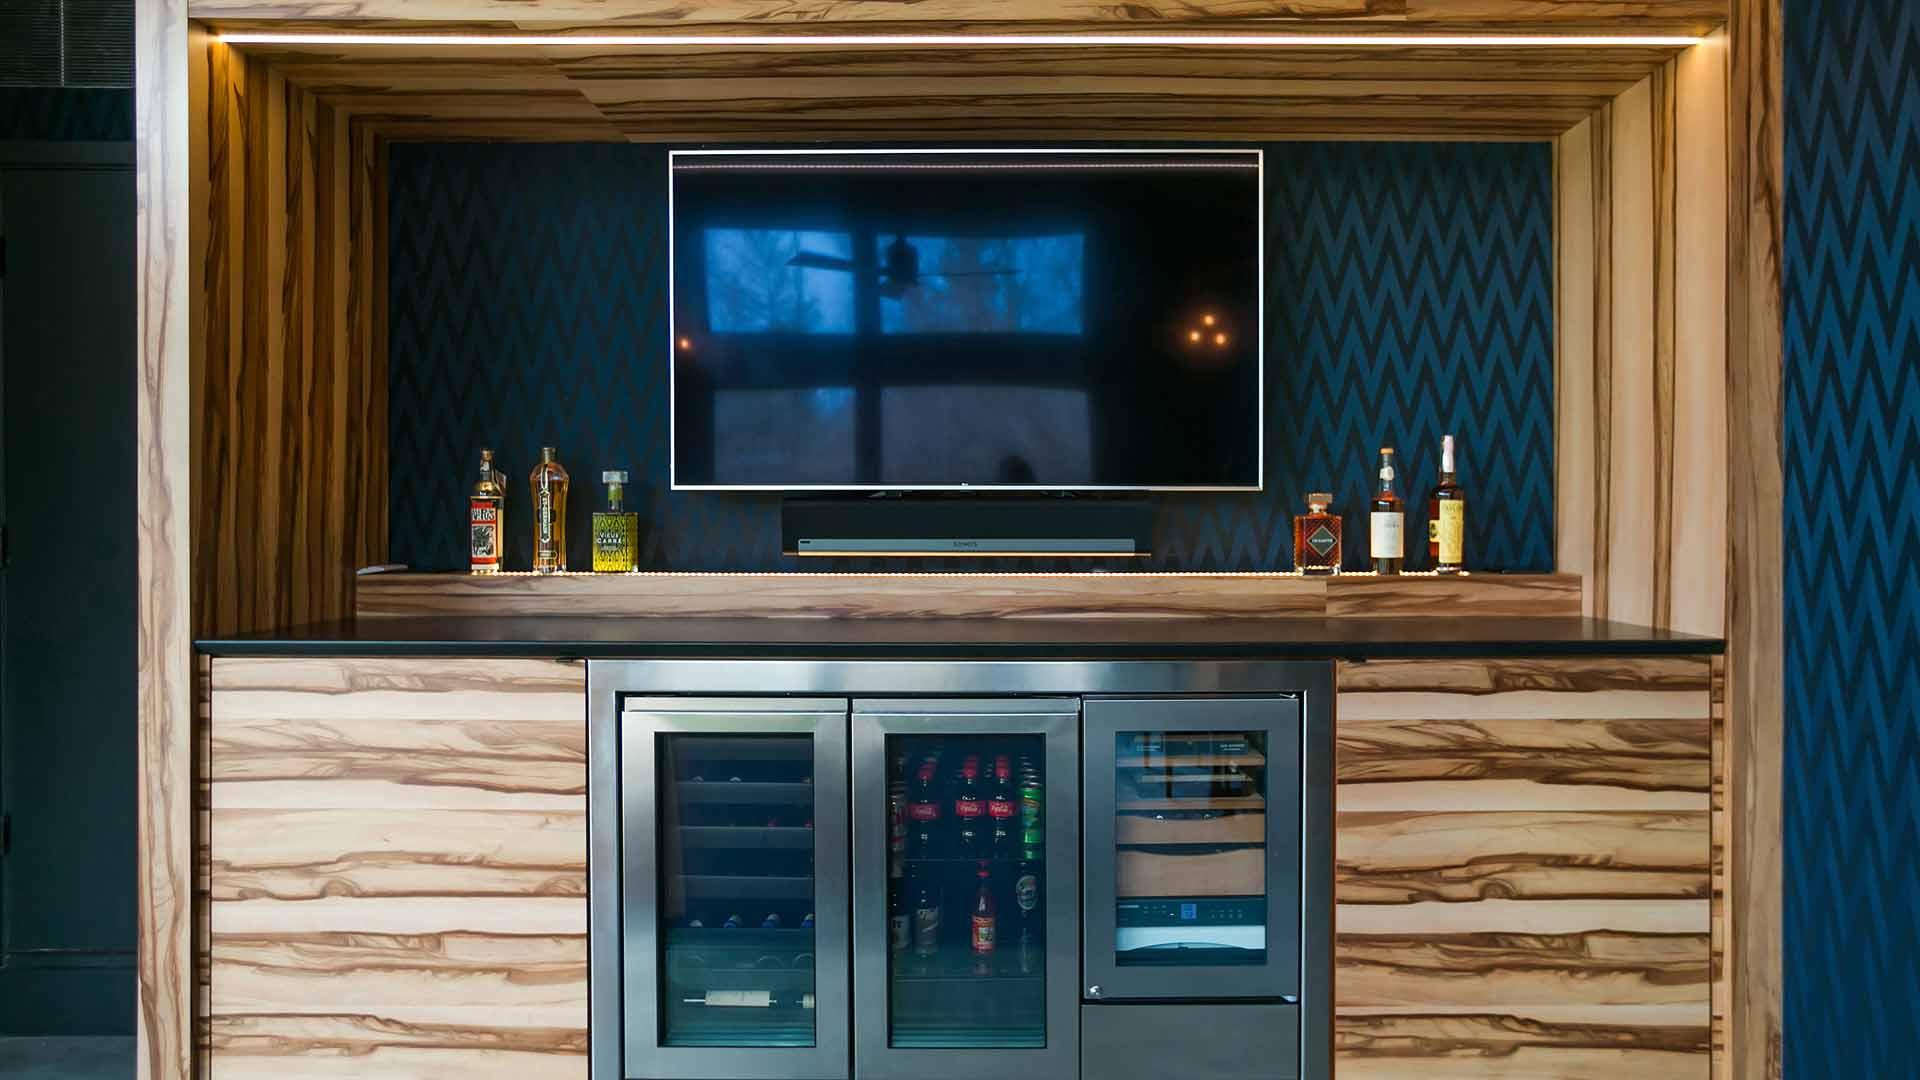 Cabinet Elevation - humidor, beverage coolers, wide screen TV - Midcentury Modern Addition (Cigar Room) - Brendonwood, Indianapolis